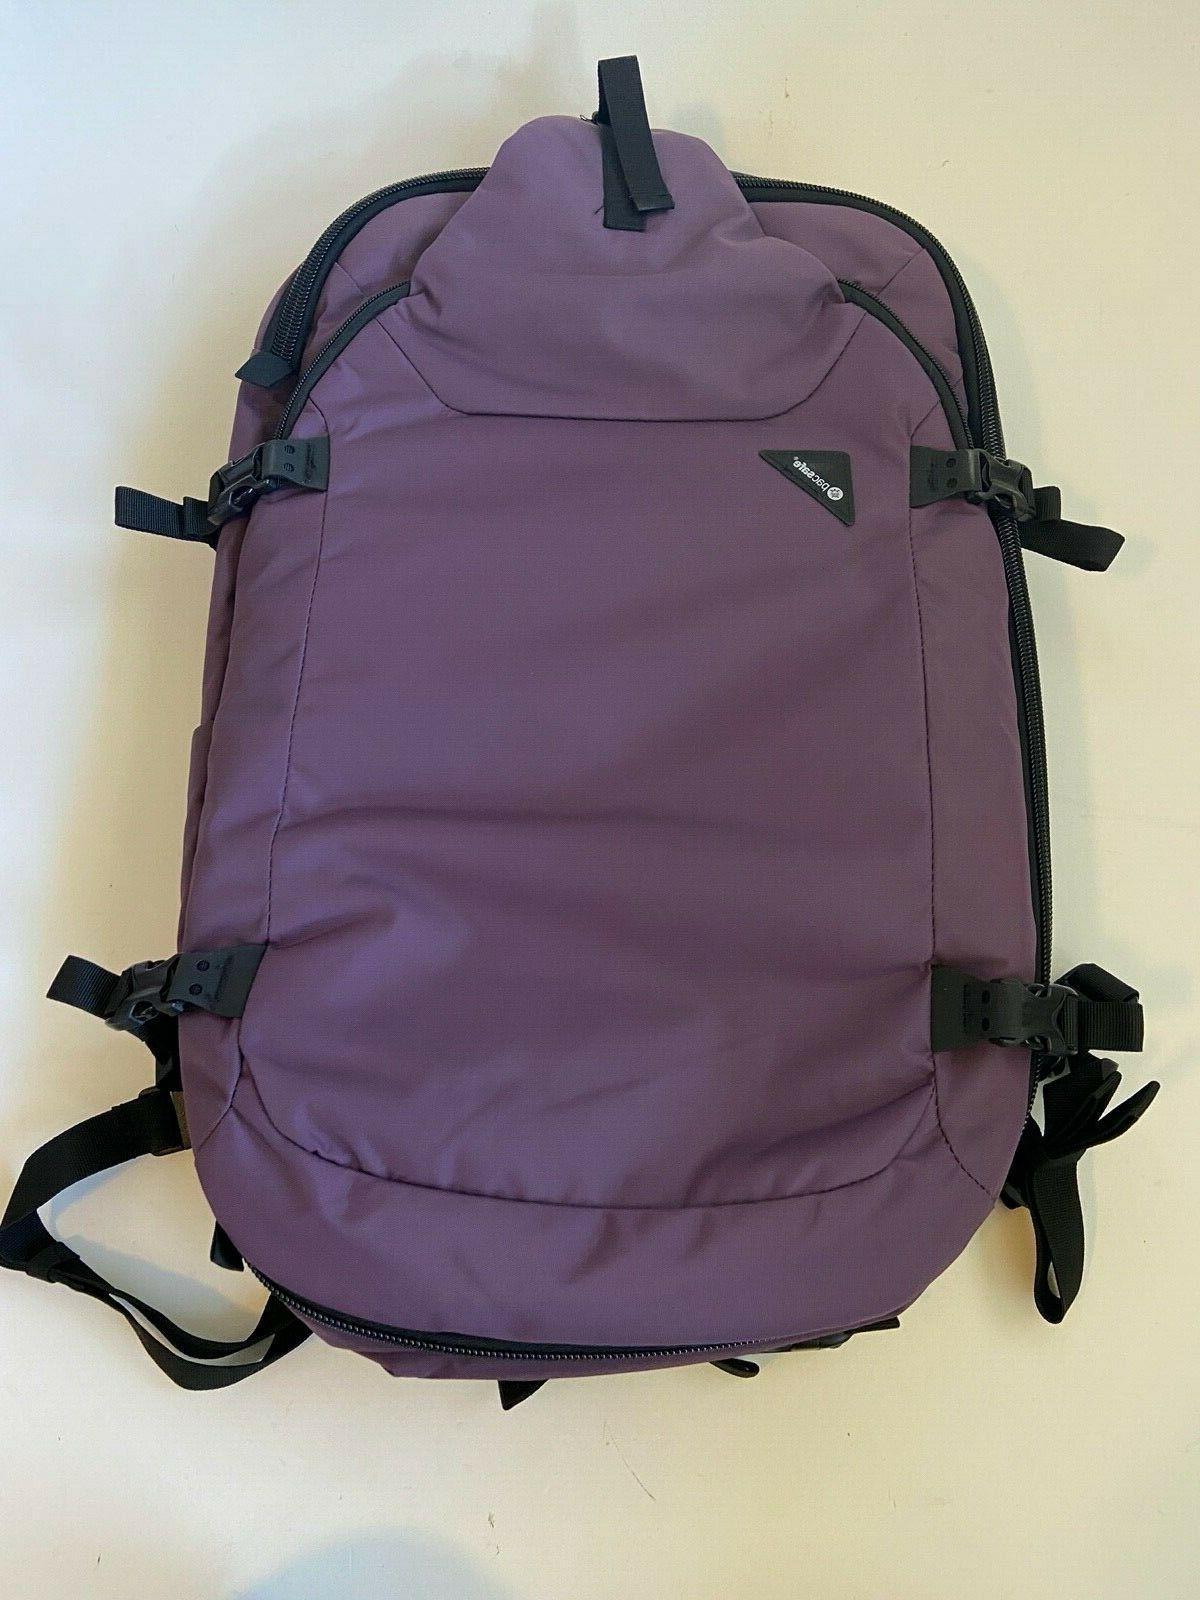 venturesafe exp45 blocking anti theft travel carry